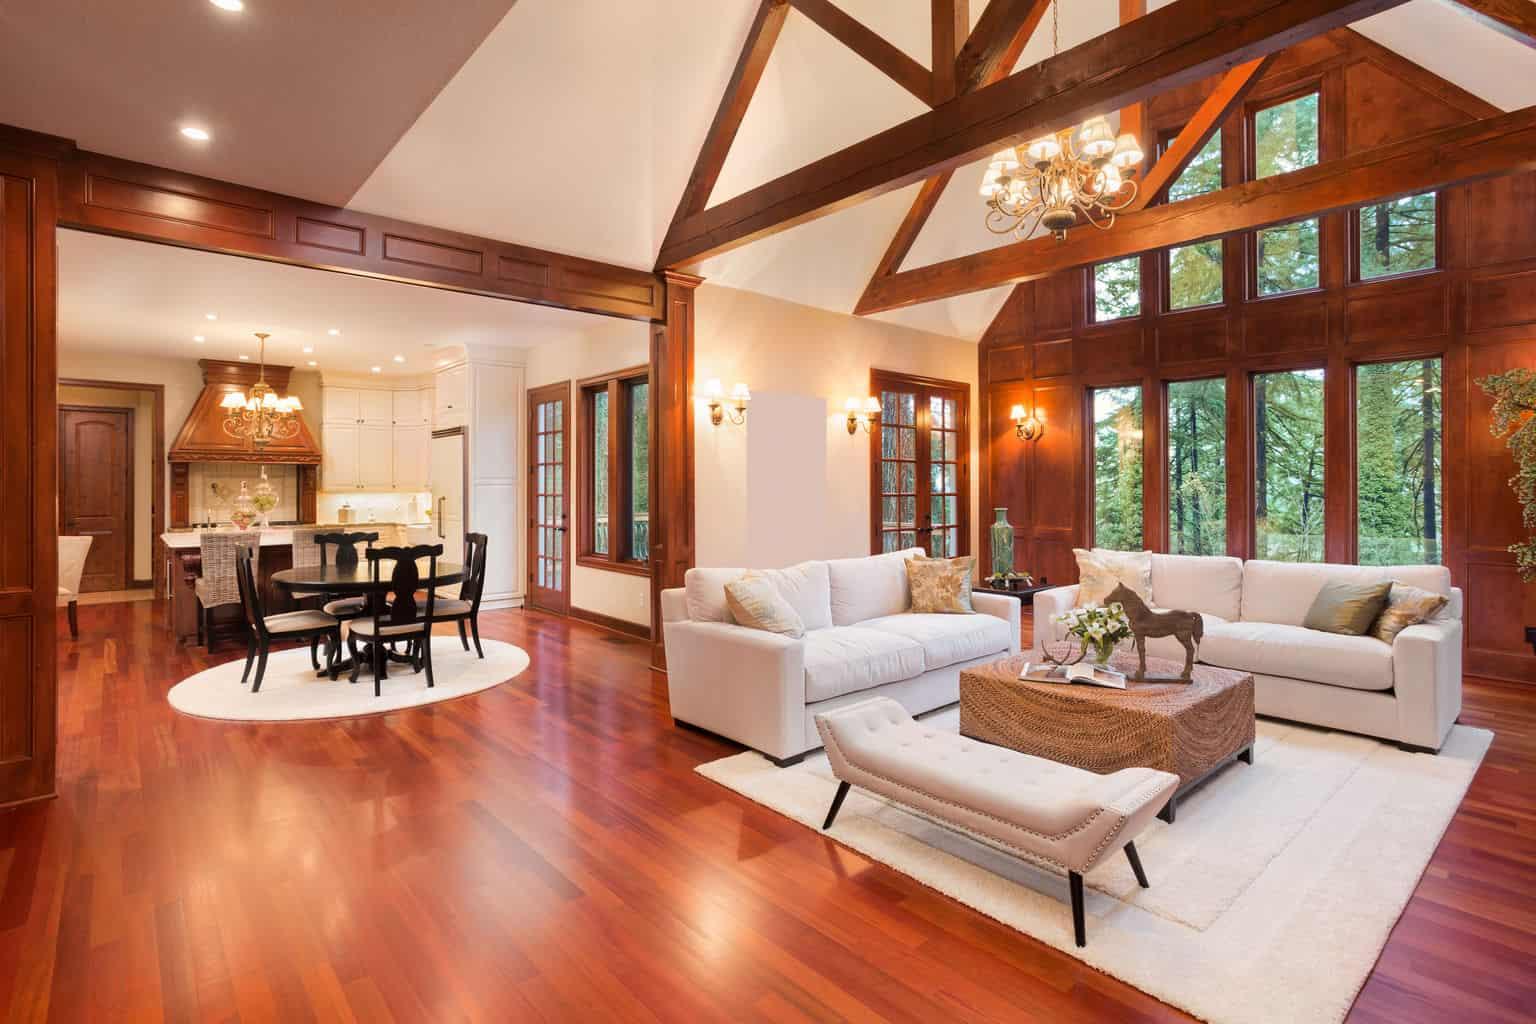 5 best engineered hardwood flooring designs